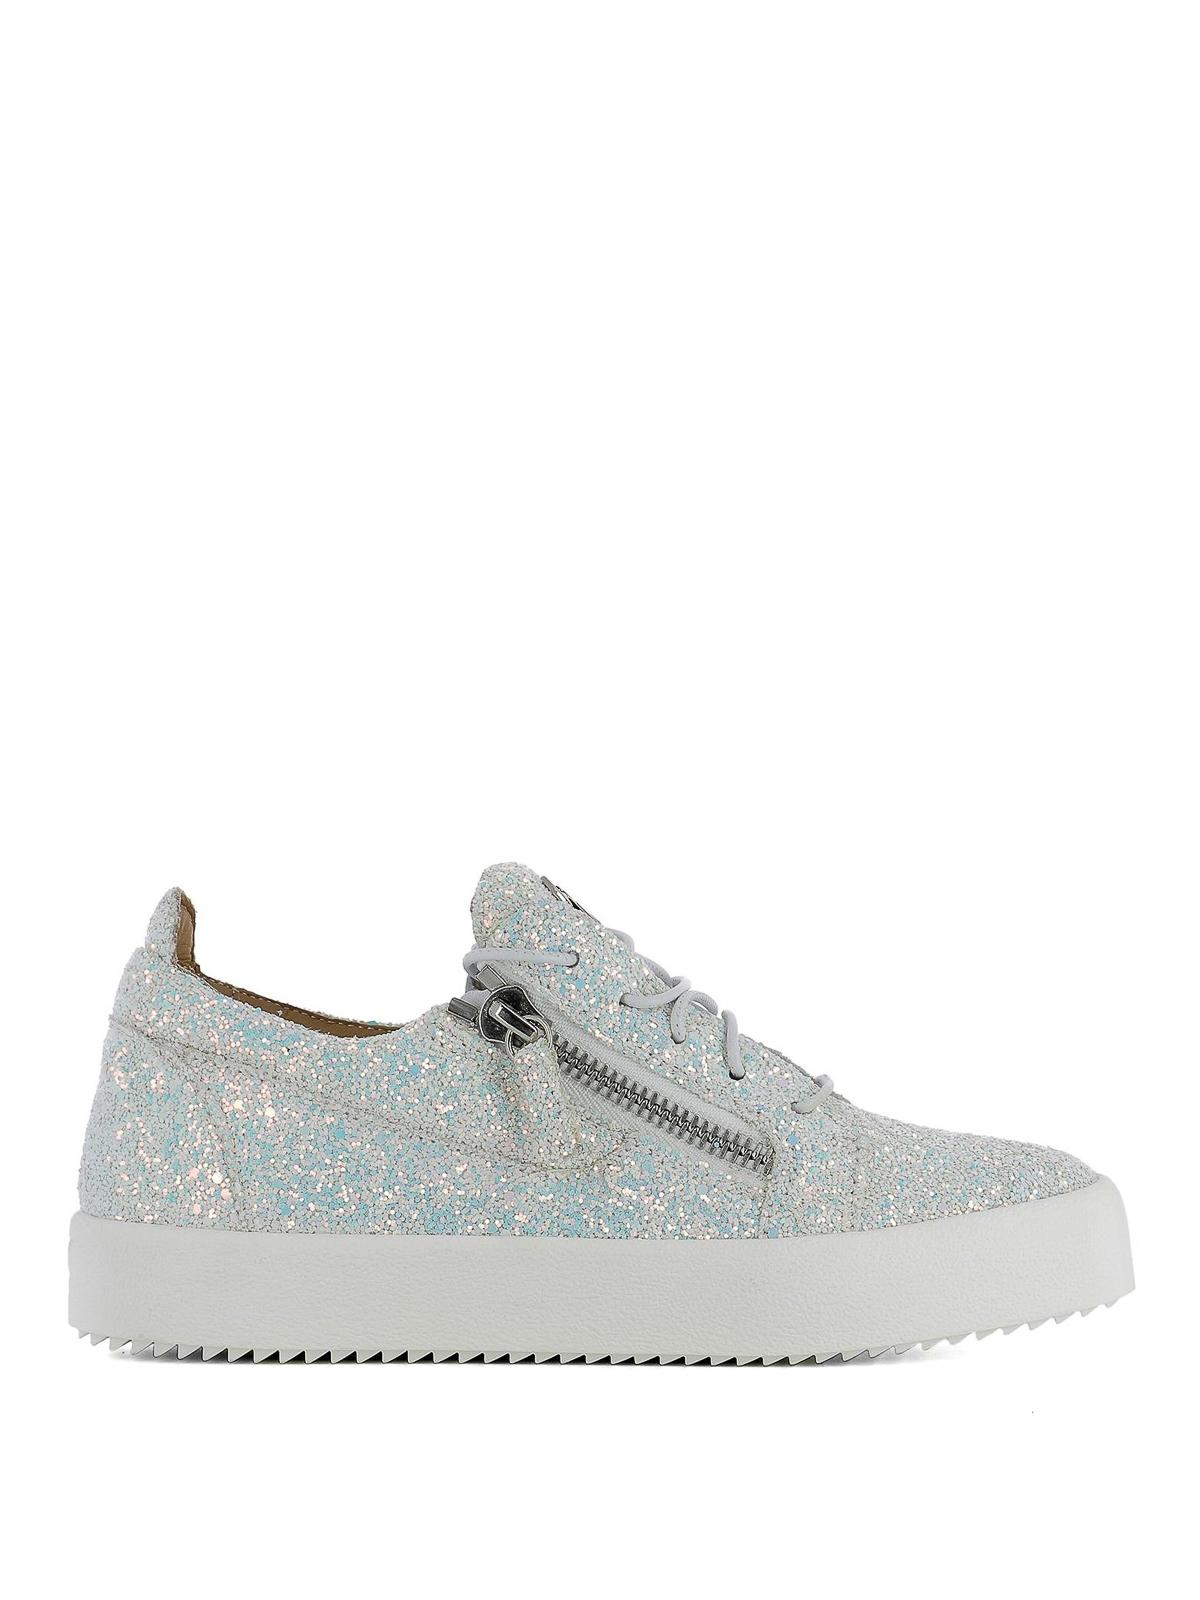 770a9f6229db8 Giuseppe Zanotti - Cheryl Glitter fabric sneakers - trainers ...